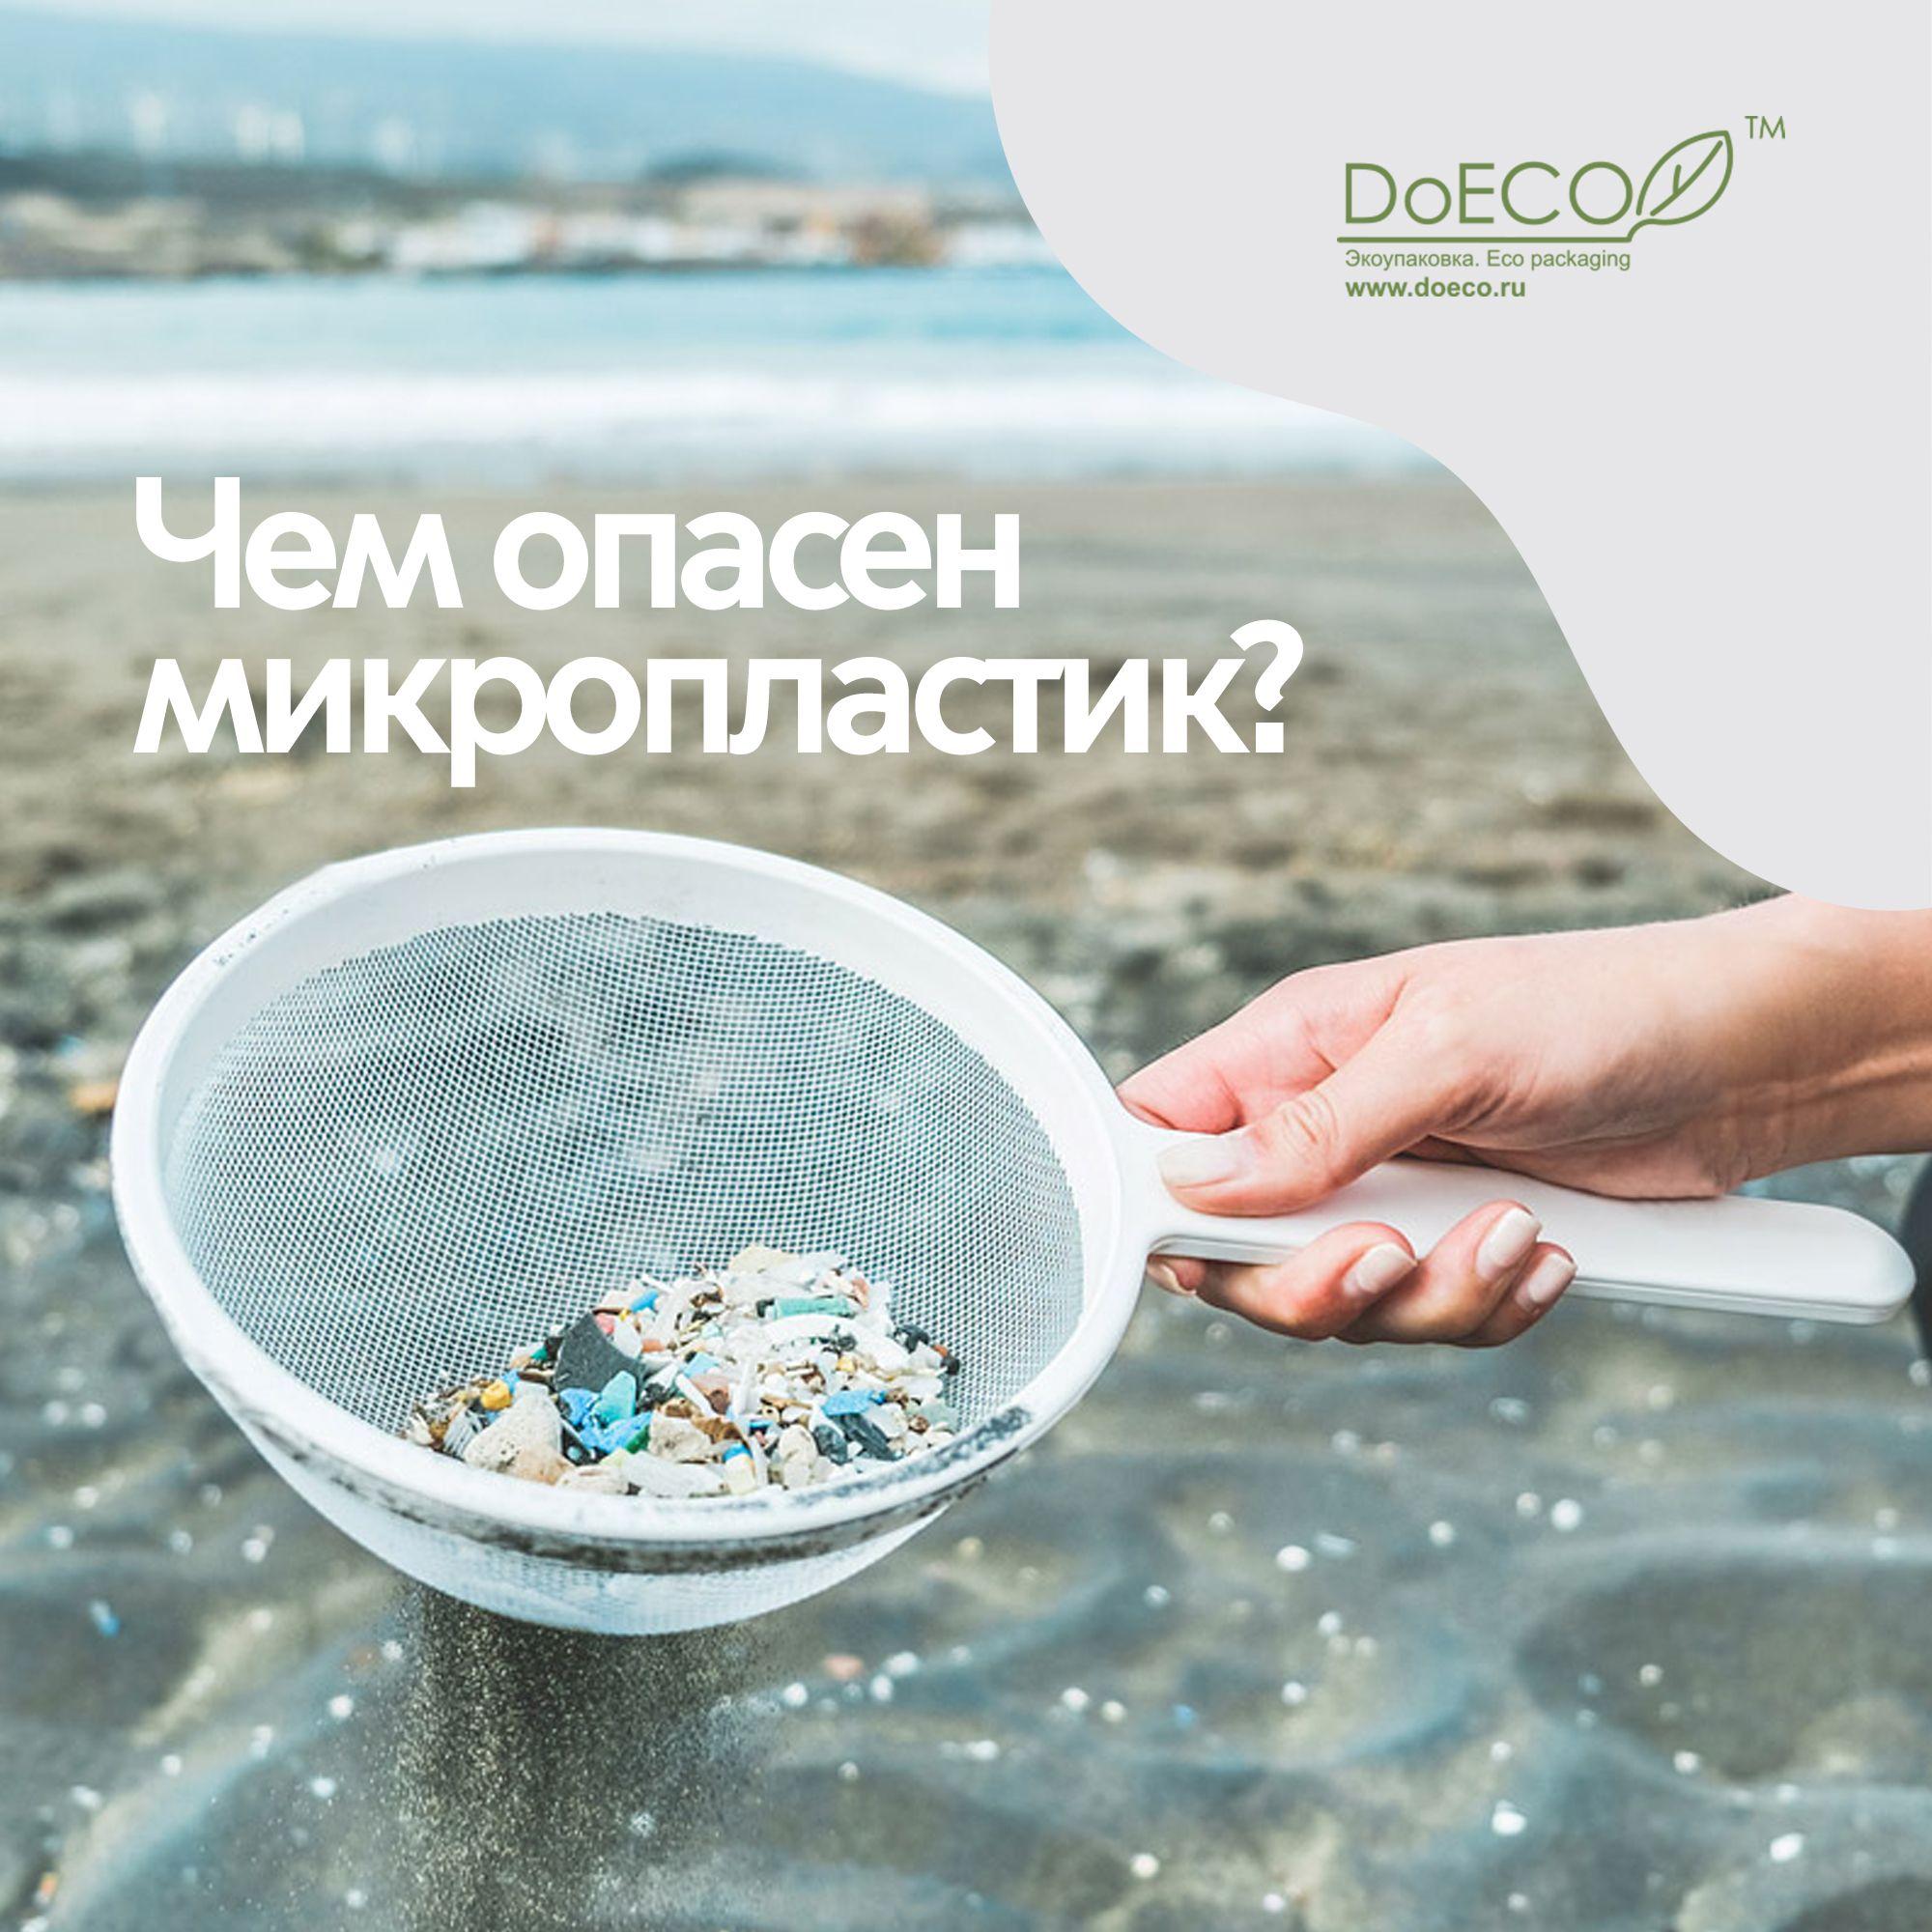 7 - Чем опасен микропластик